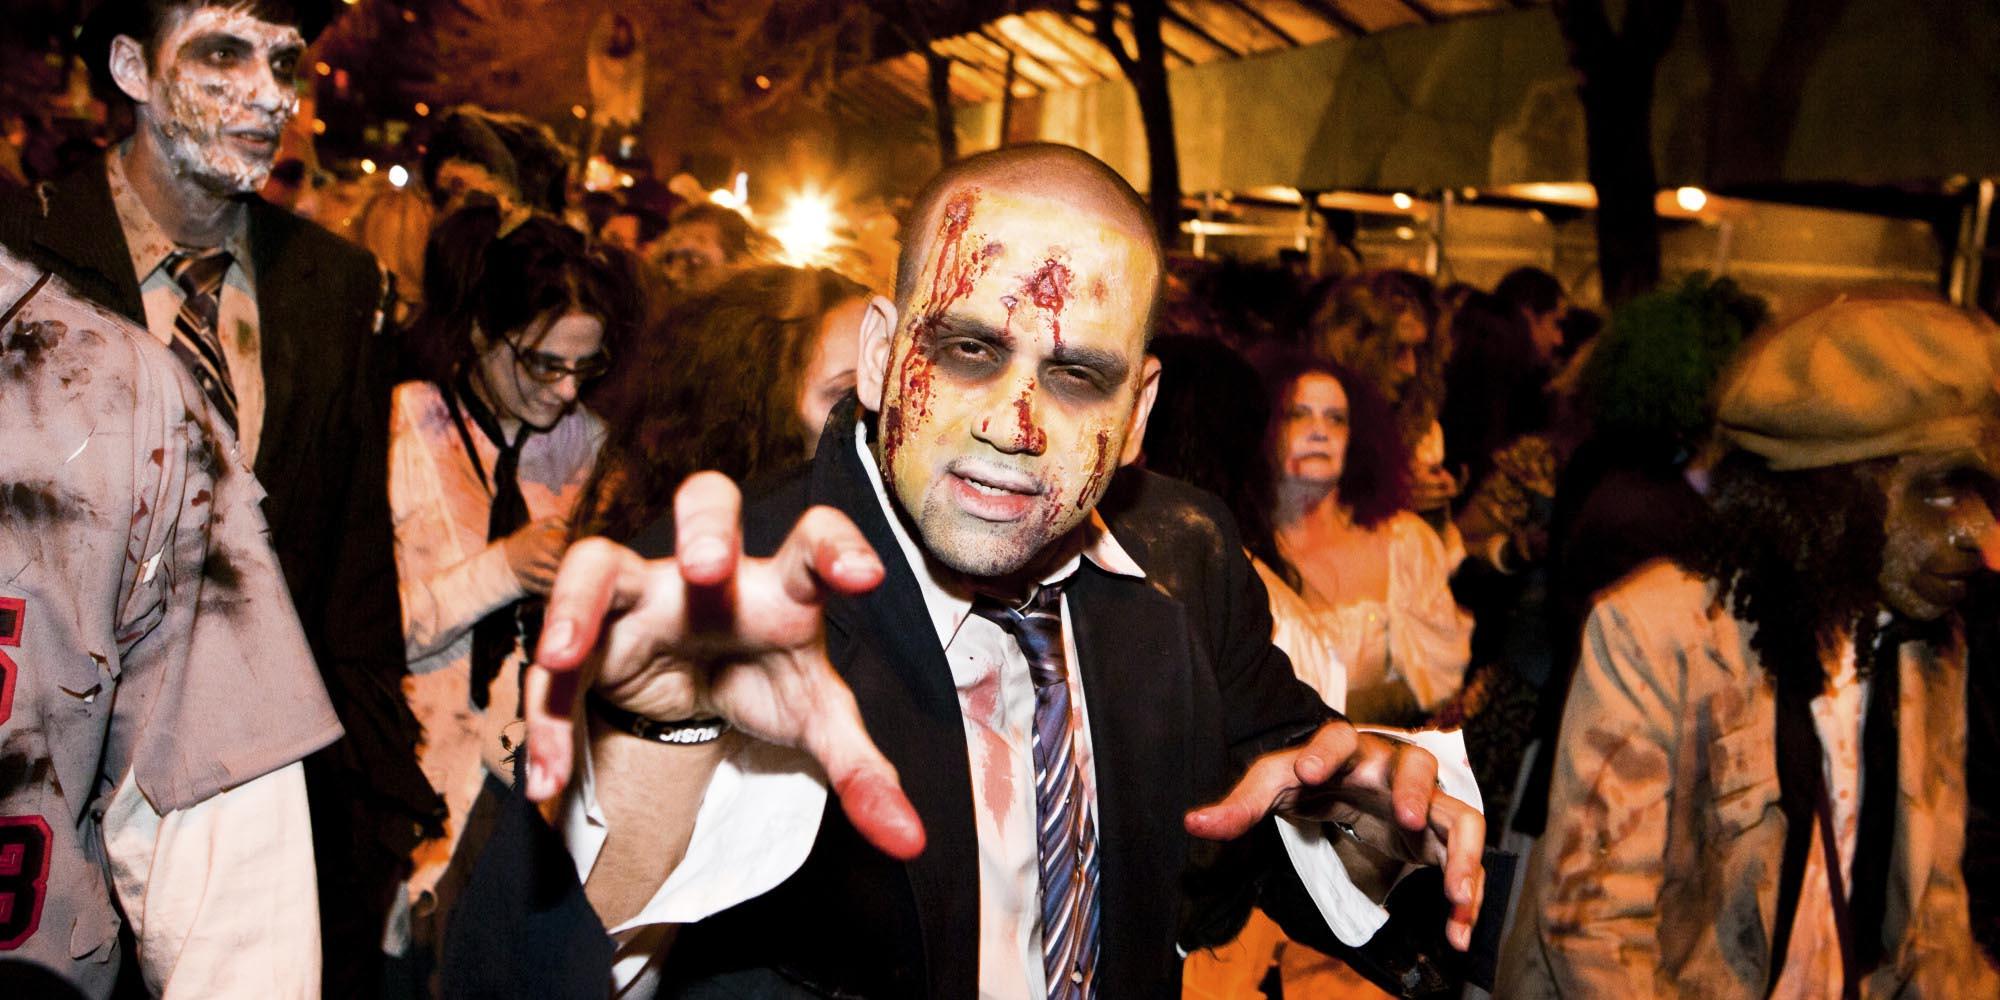 Millenial-Halloween-Party.jpg